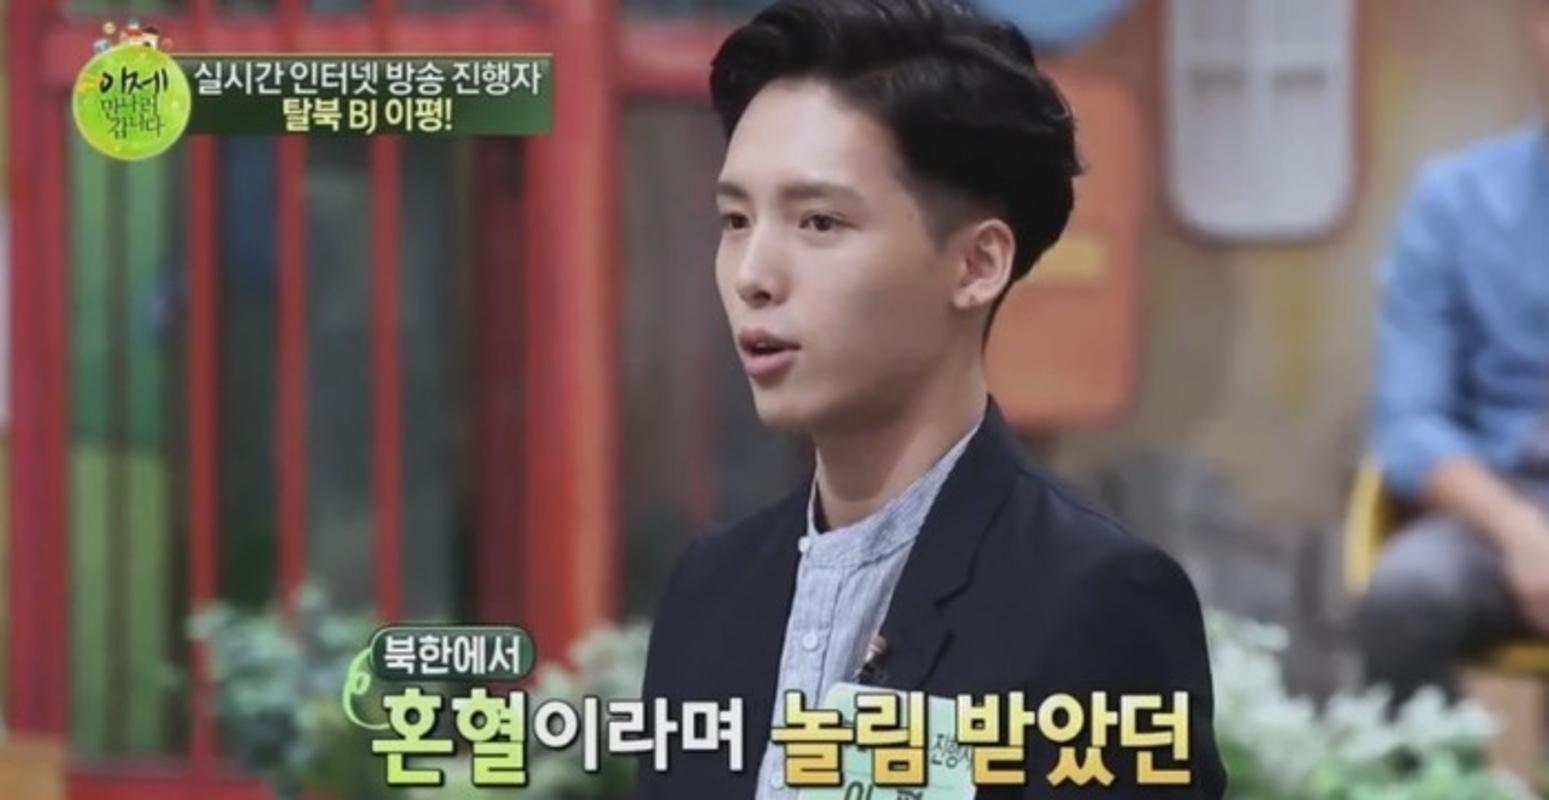 korean streamers who look good enough to be idols - koreaboo